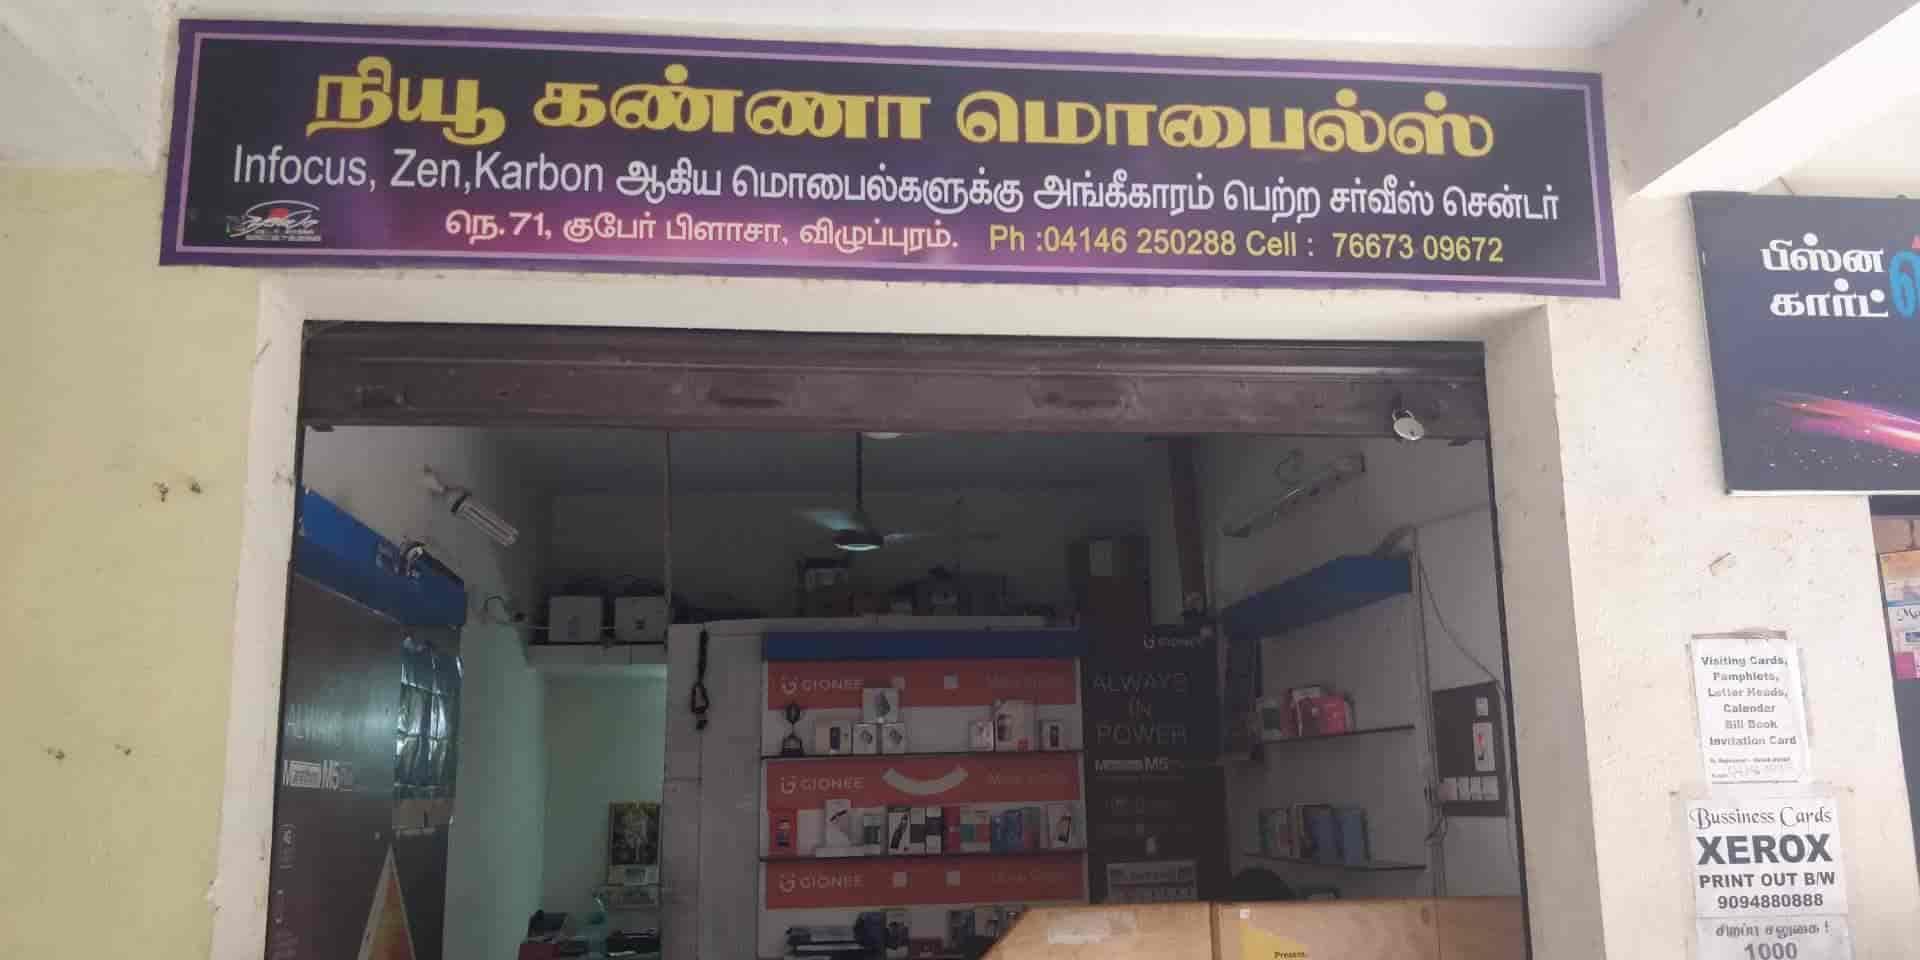 New Kanna Mobiles Photos, Poonthottam, Villupuram- Pictures